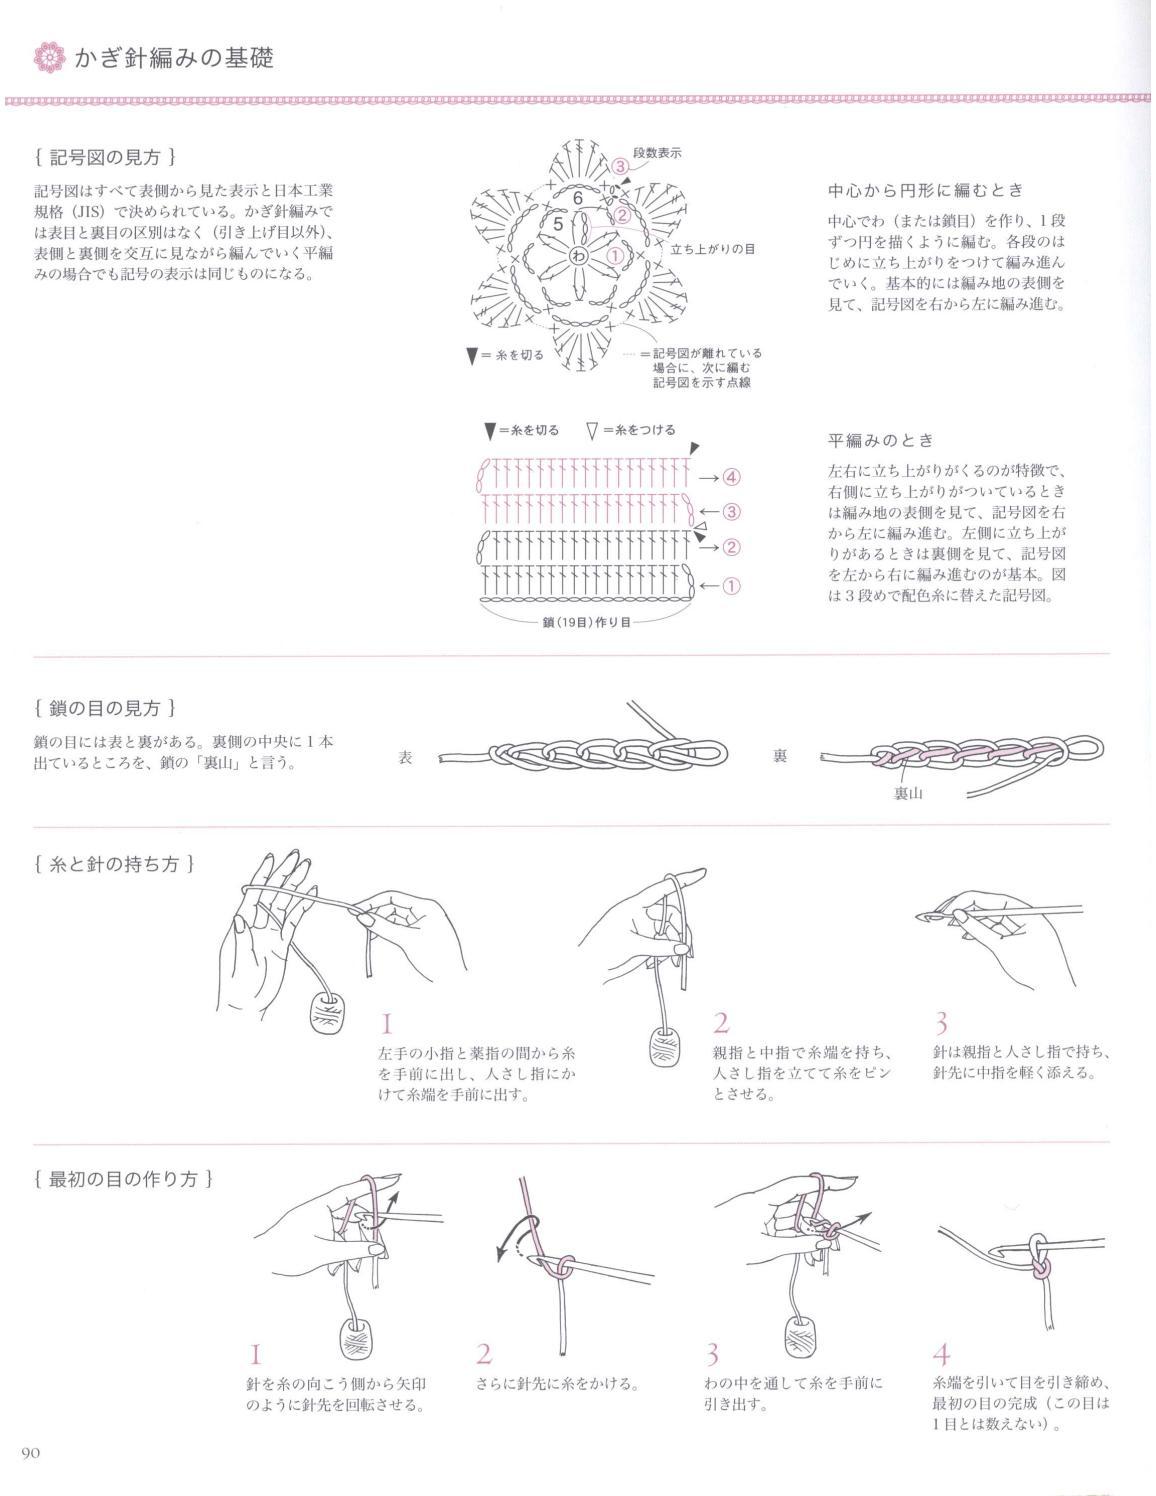 Asahi original crochet best selection 2012 page 90